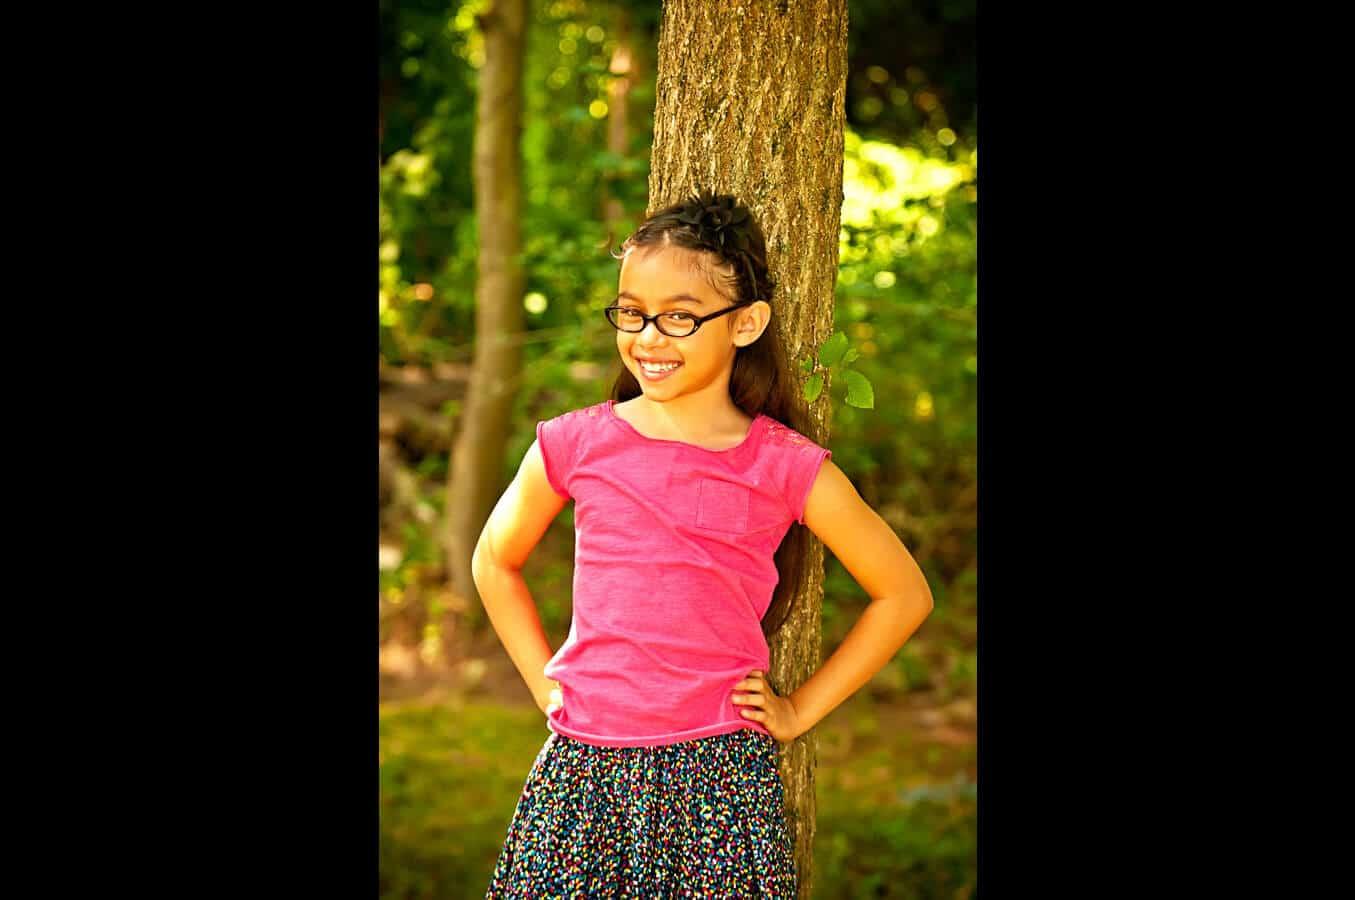 child, portrait, outdoor, natural light, Northern VA